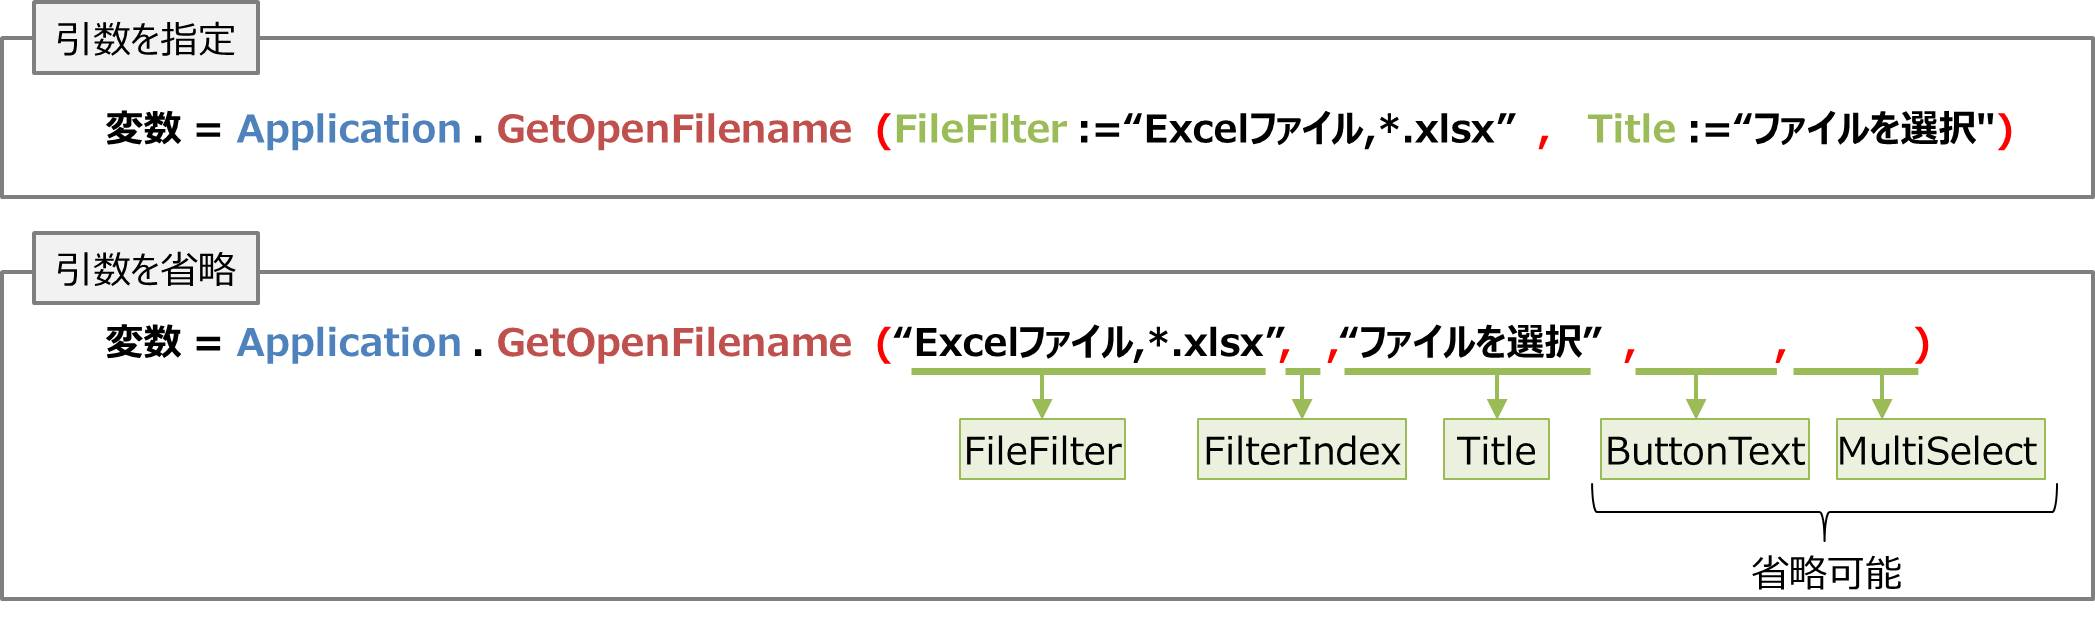 etOpenFilenameメソッドの構文の使い方2